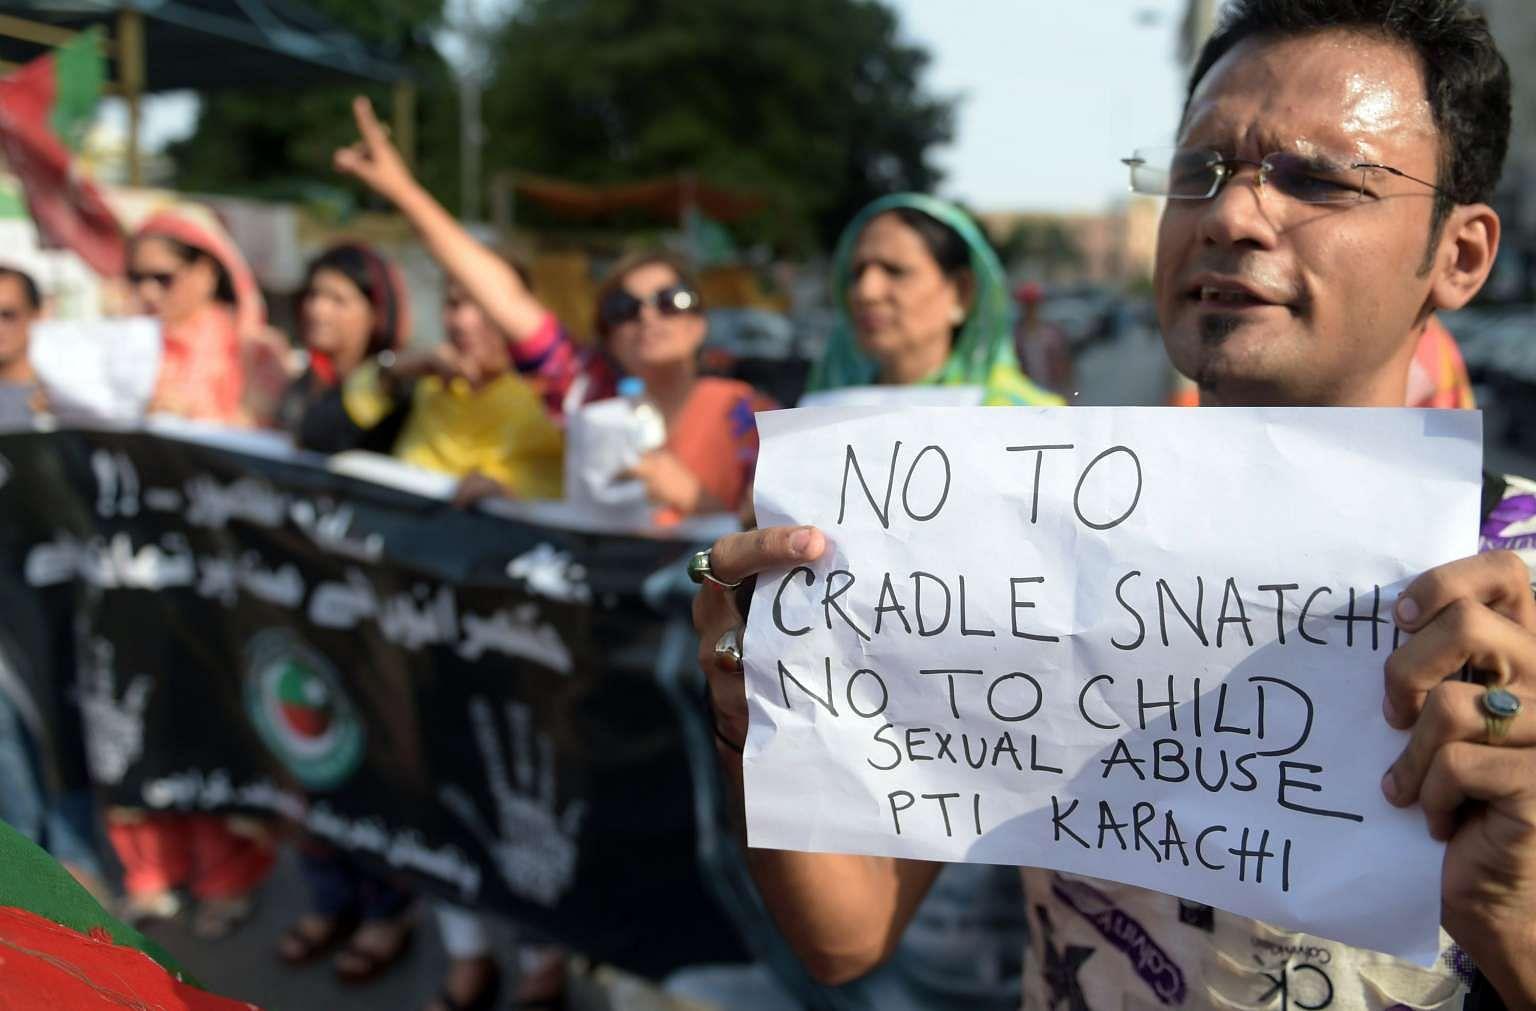 Karachi rap sex scandles